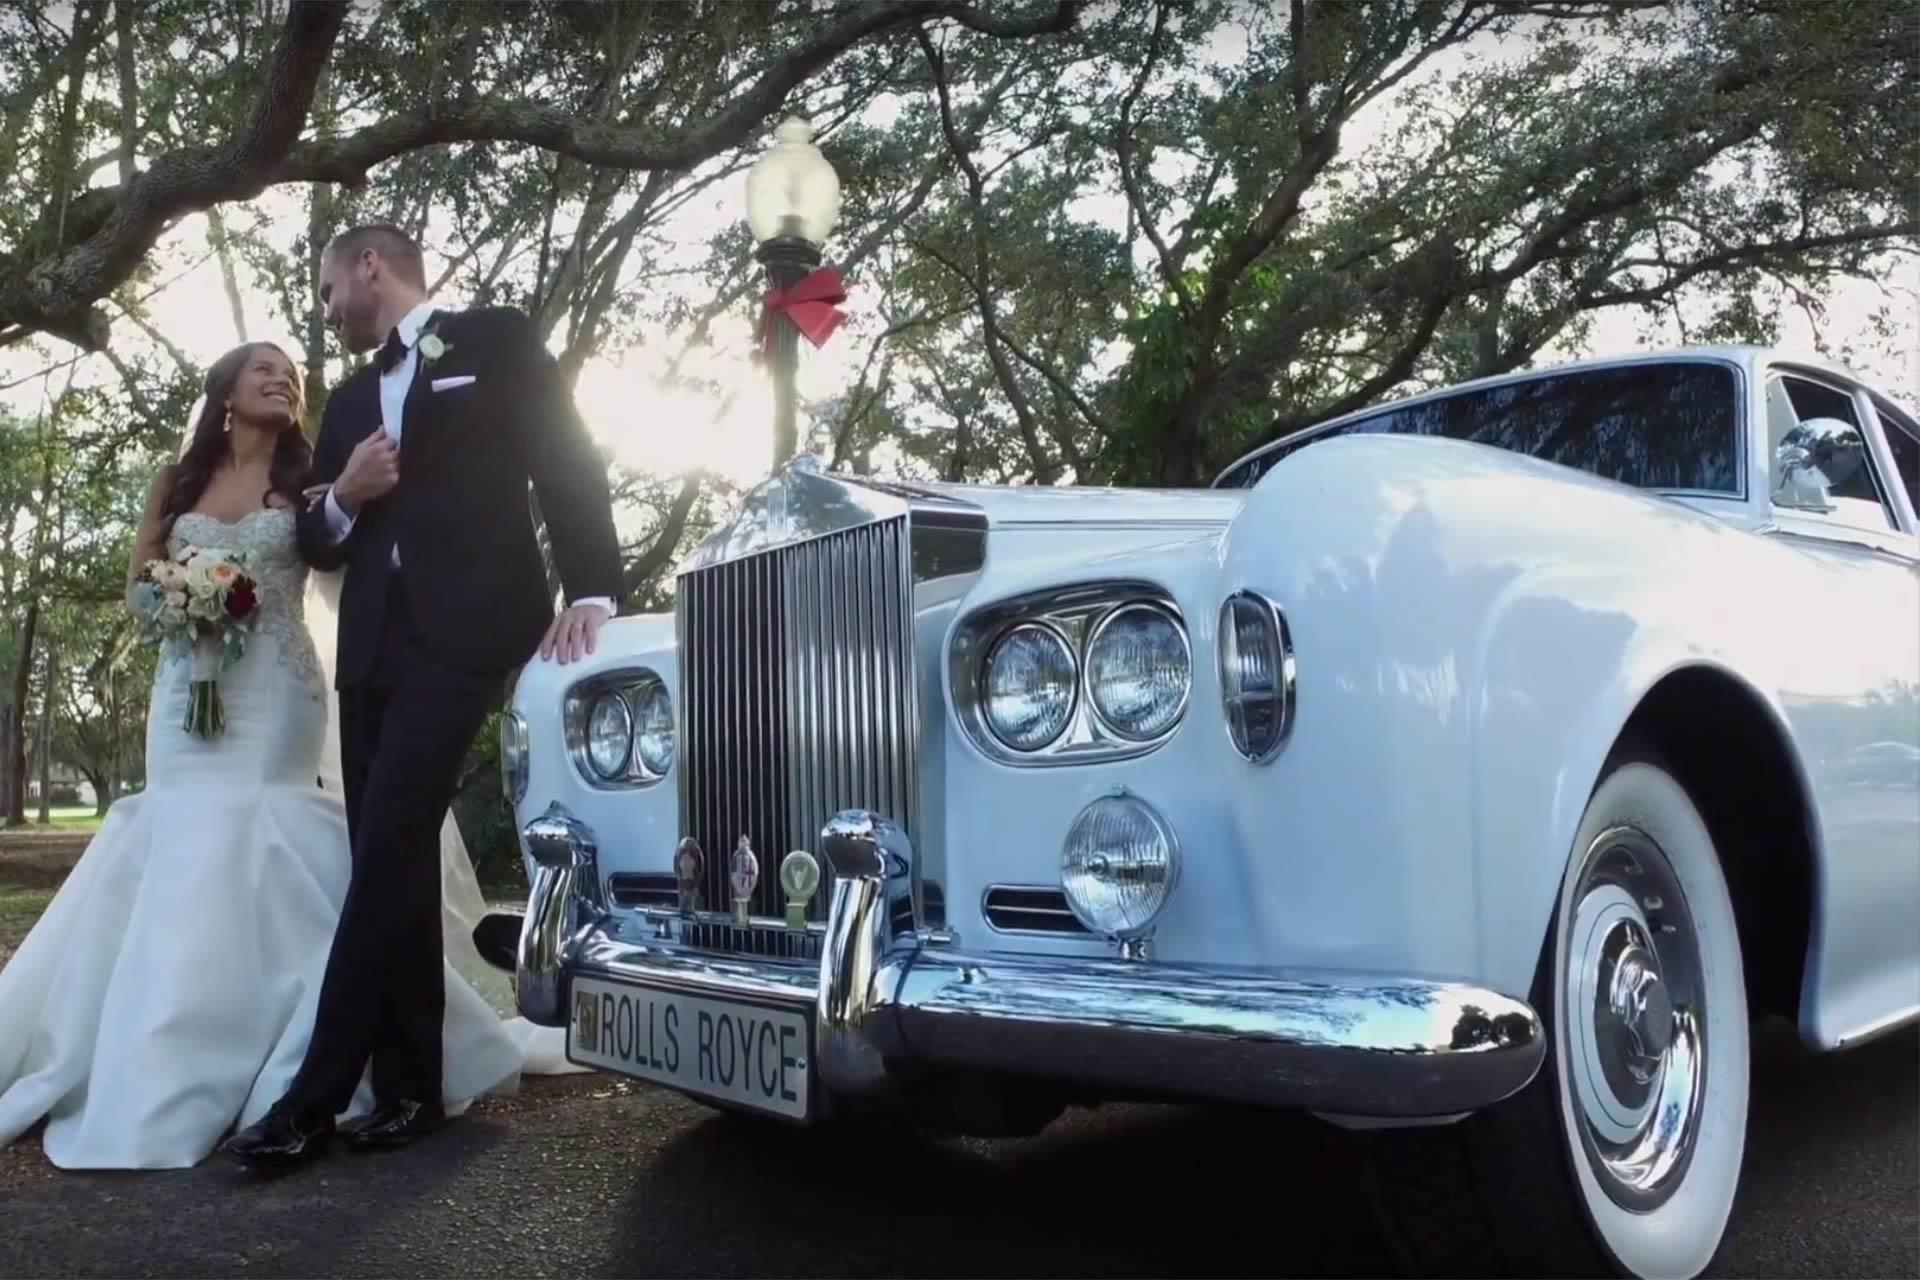 Vip Wedding Transportation - Image provided by: RiantFilms.com